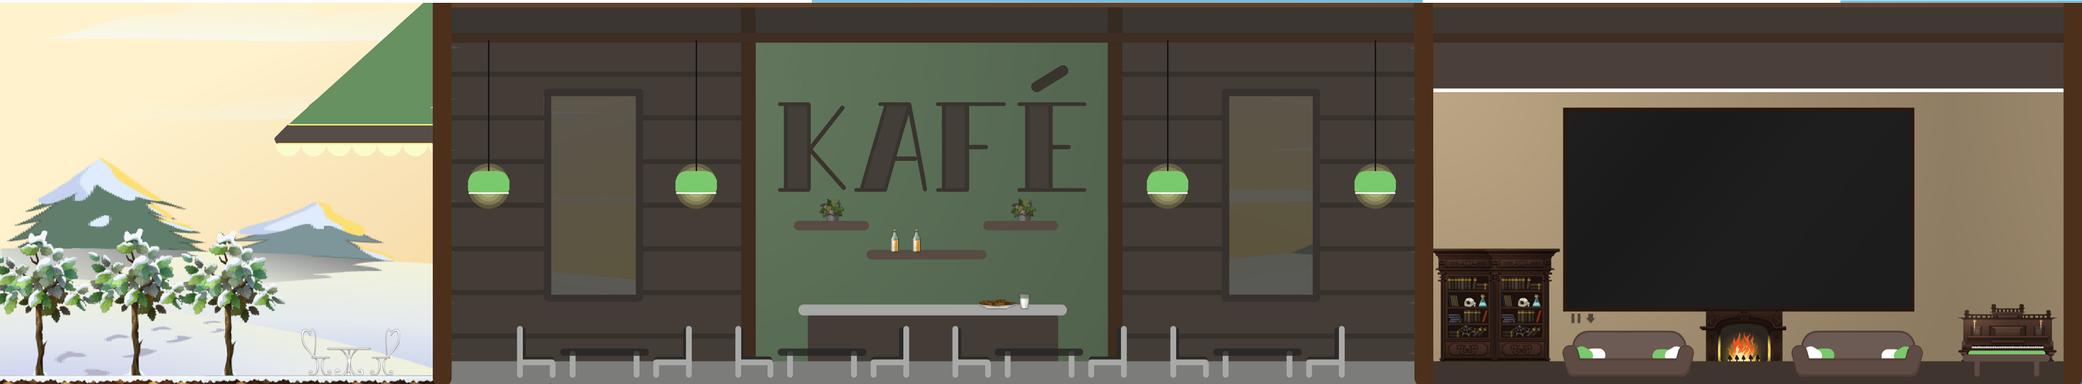 http://pre10.deviantart.net/3940/th/pre/f/2016/362/a/8/tfm_map__the_kafe_by_xsilverraven-dat7uk3.png